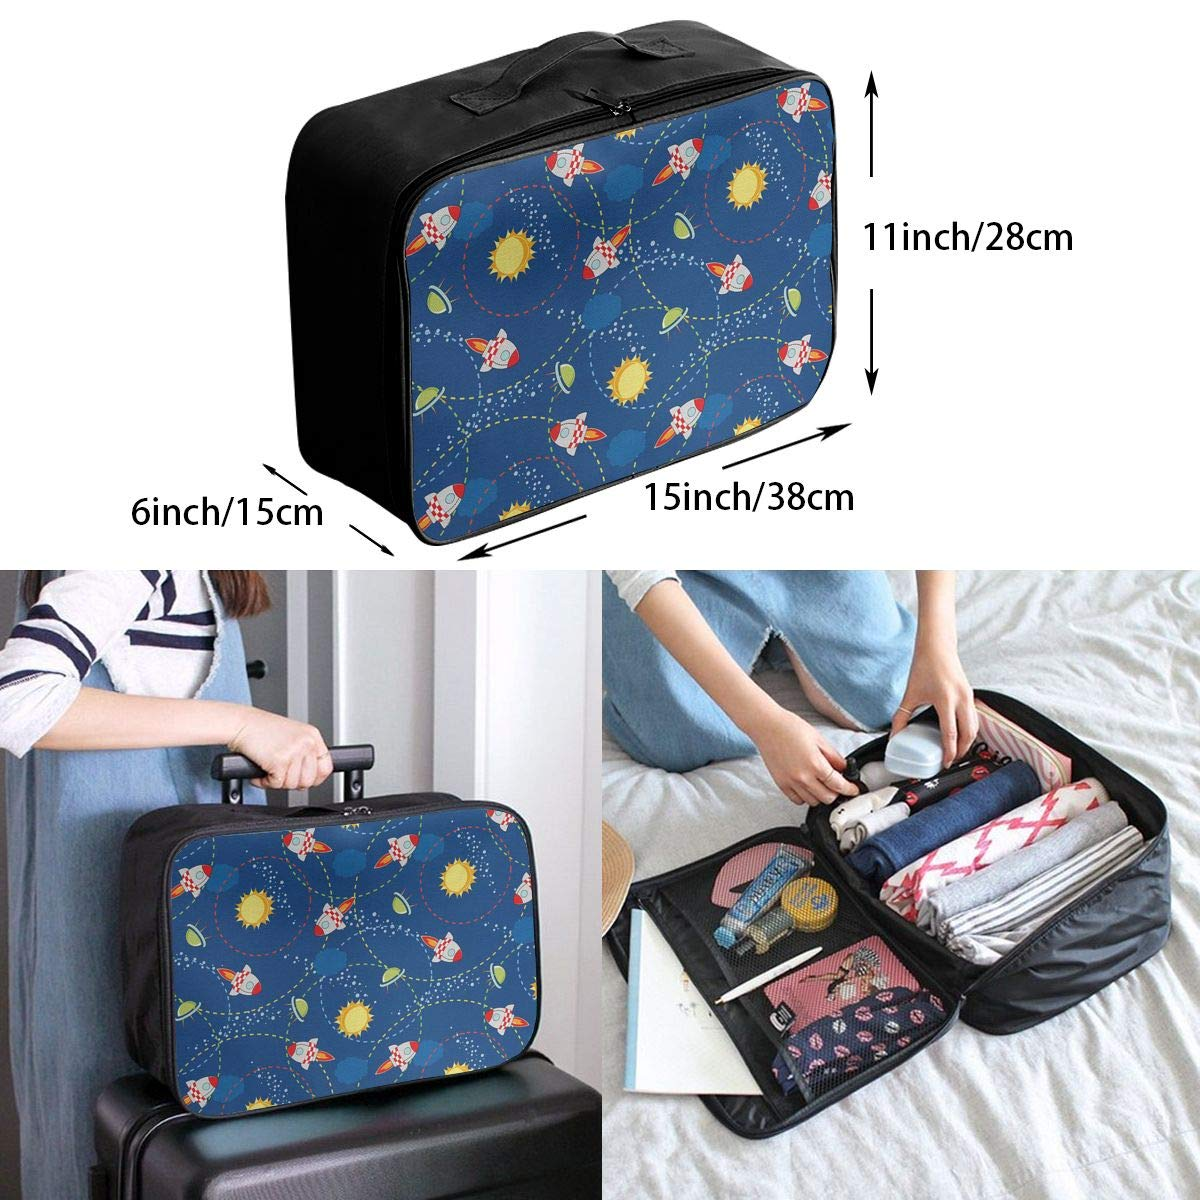 ADGAI Cute Little Cartoon Rocket Canvas Travel Weekender Bag,Fashion Custom Lightweight Large Capacity Portable Luggage Bag,Suitcase Trolley Bag